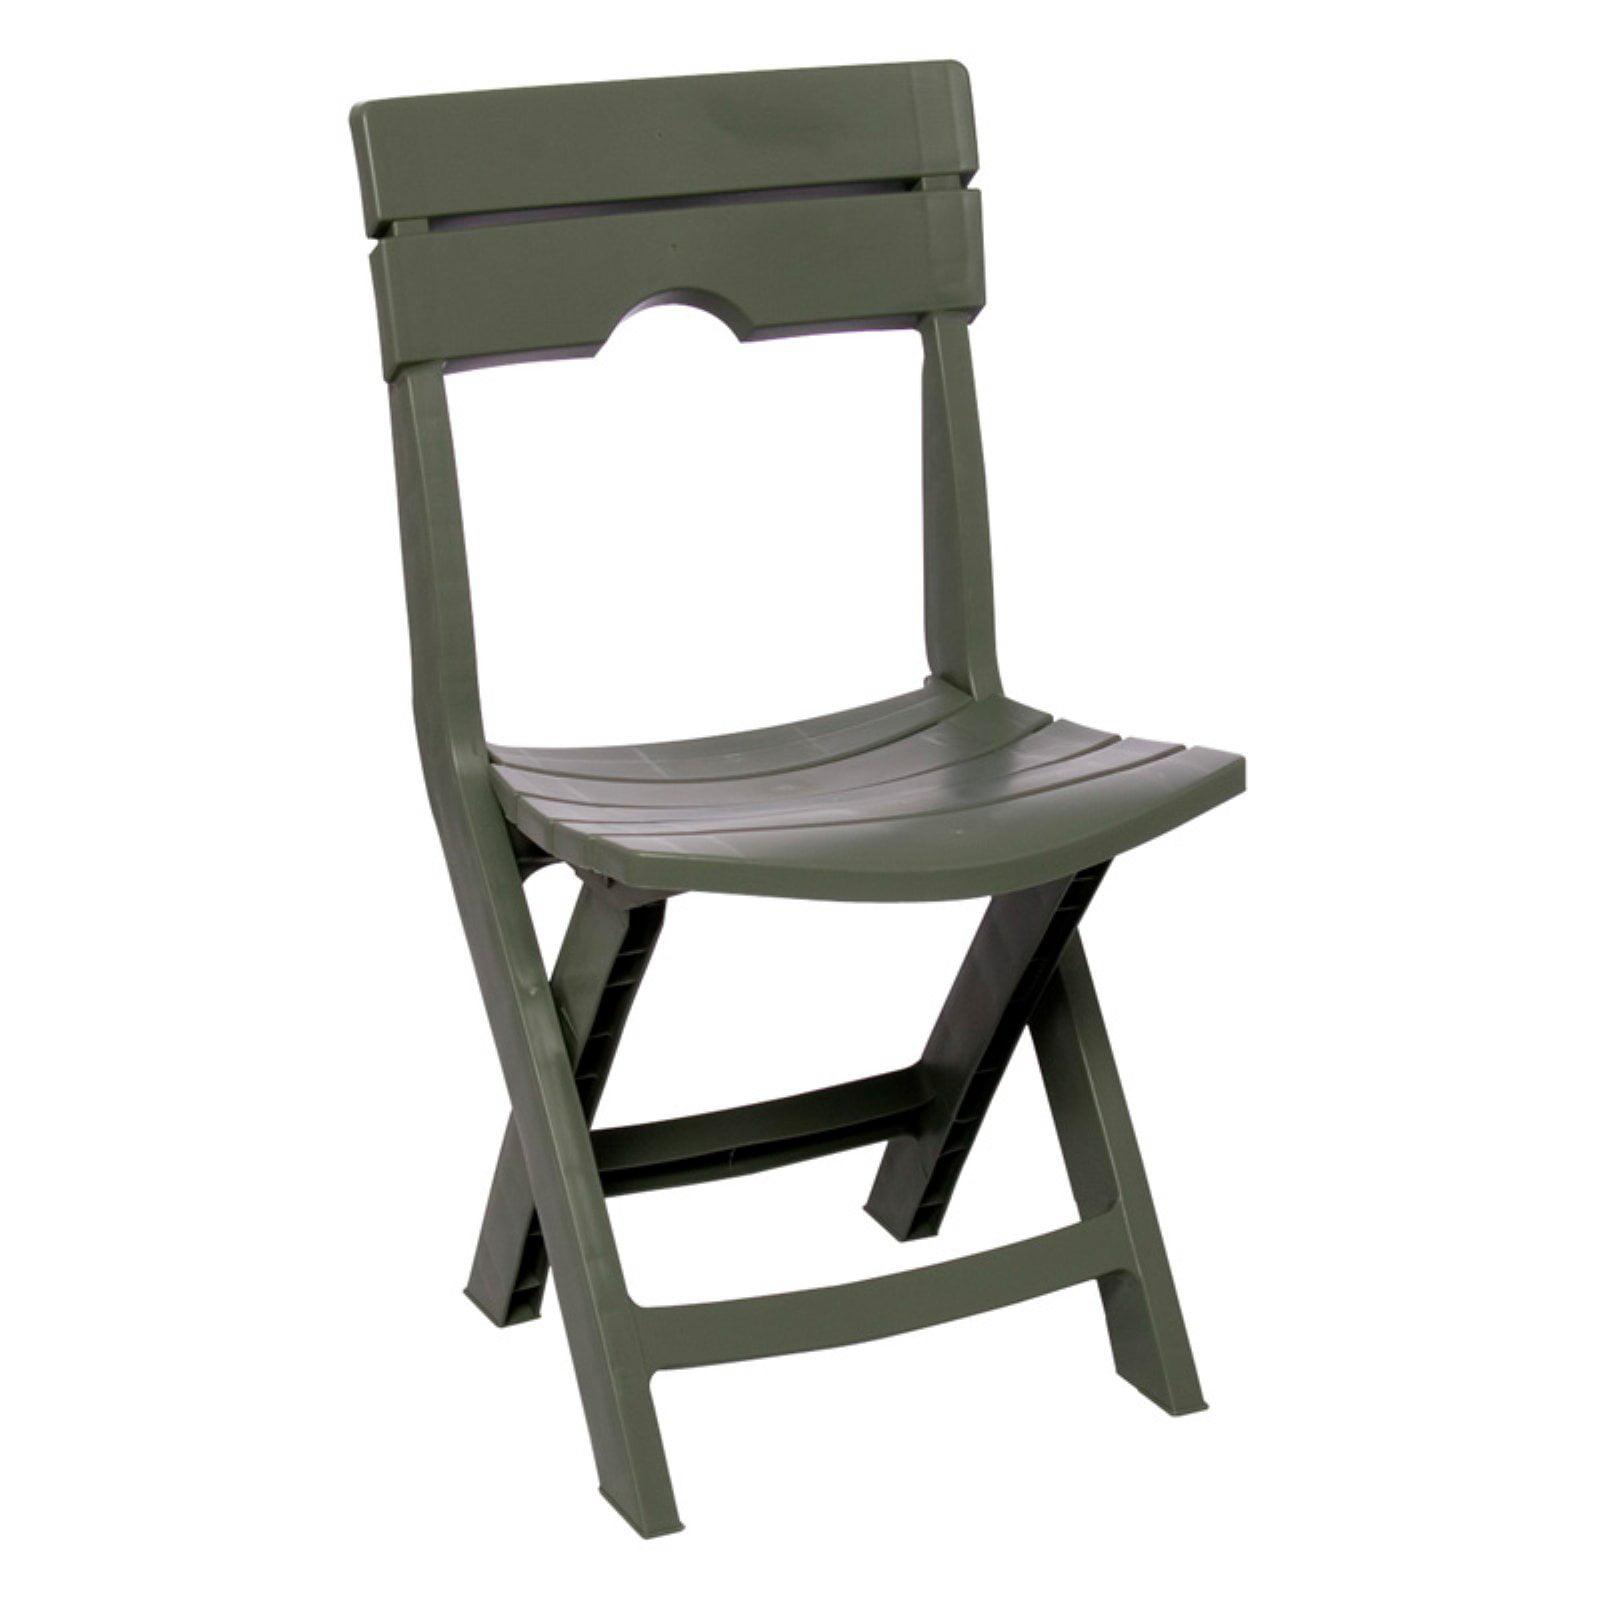 Adams Manufacturing Quik-Fold Chair, Sage